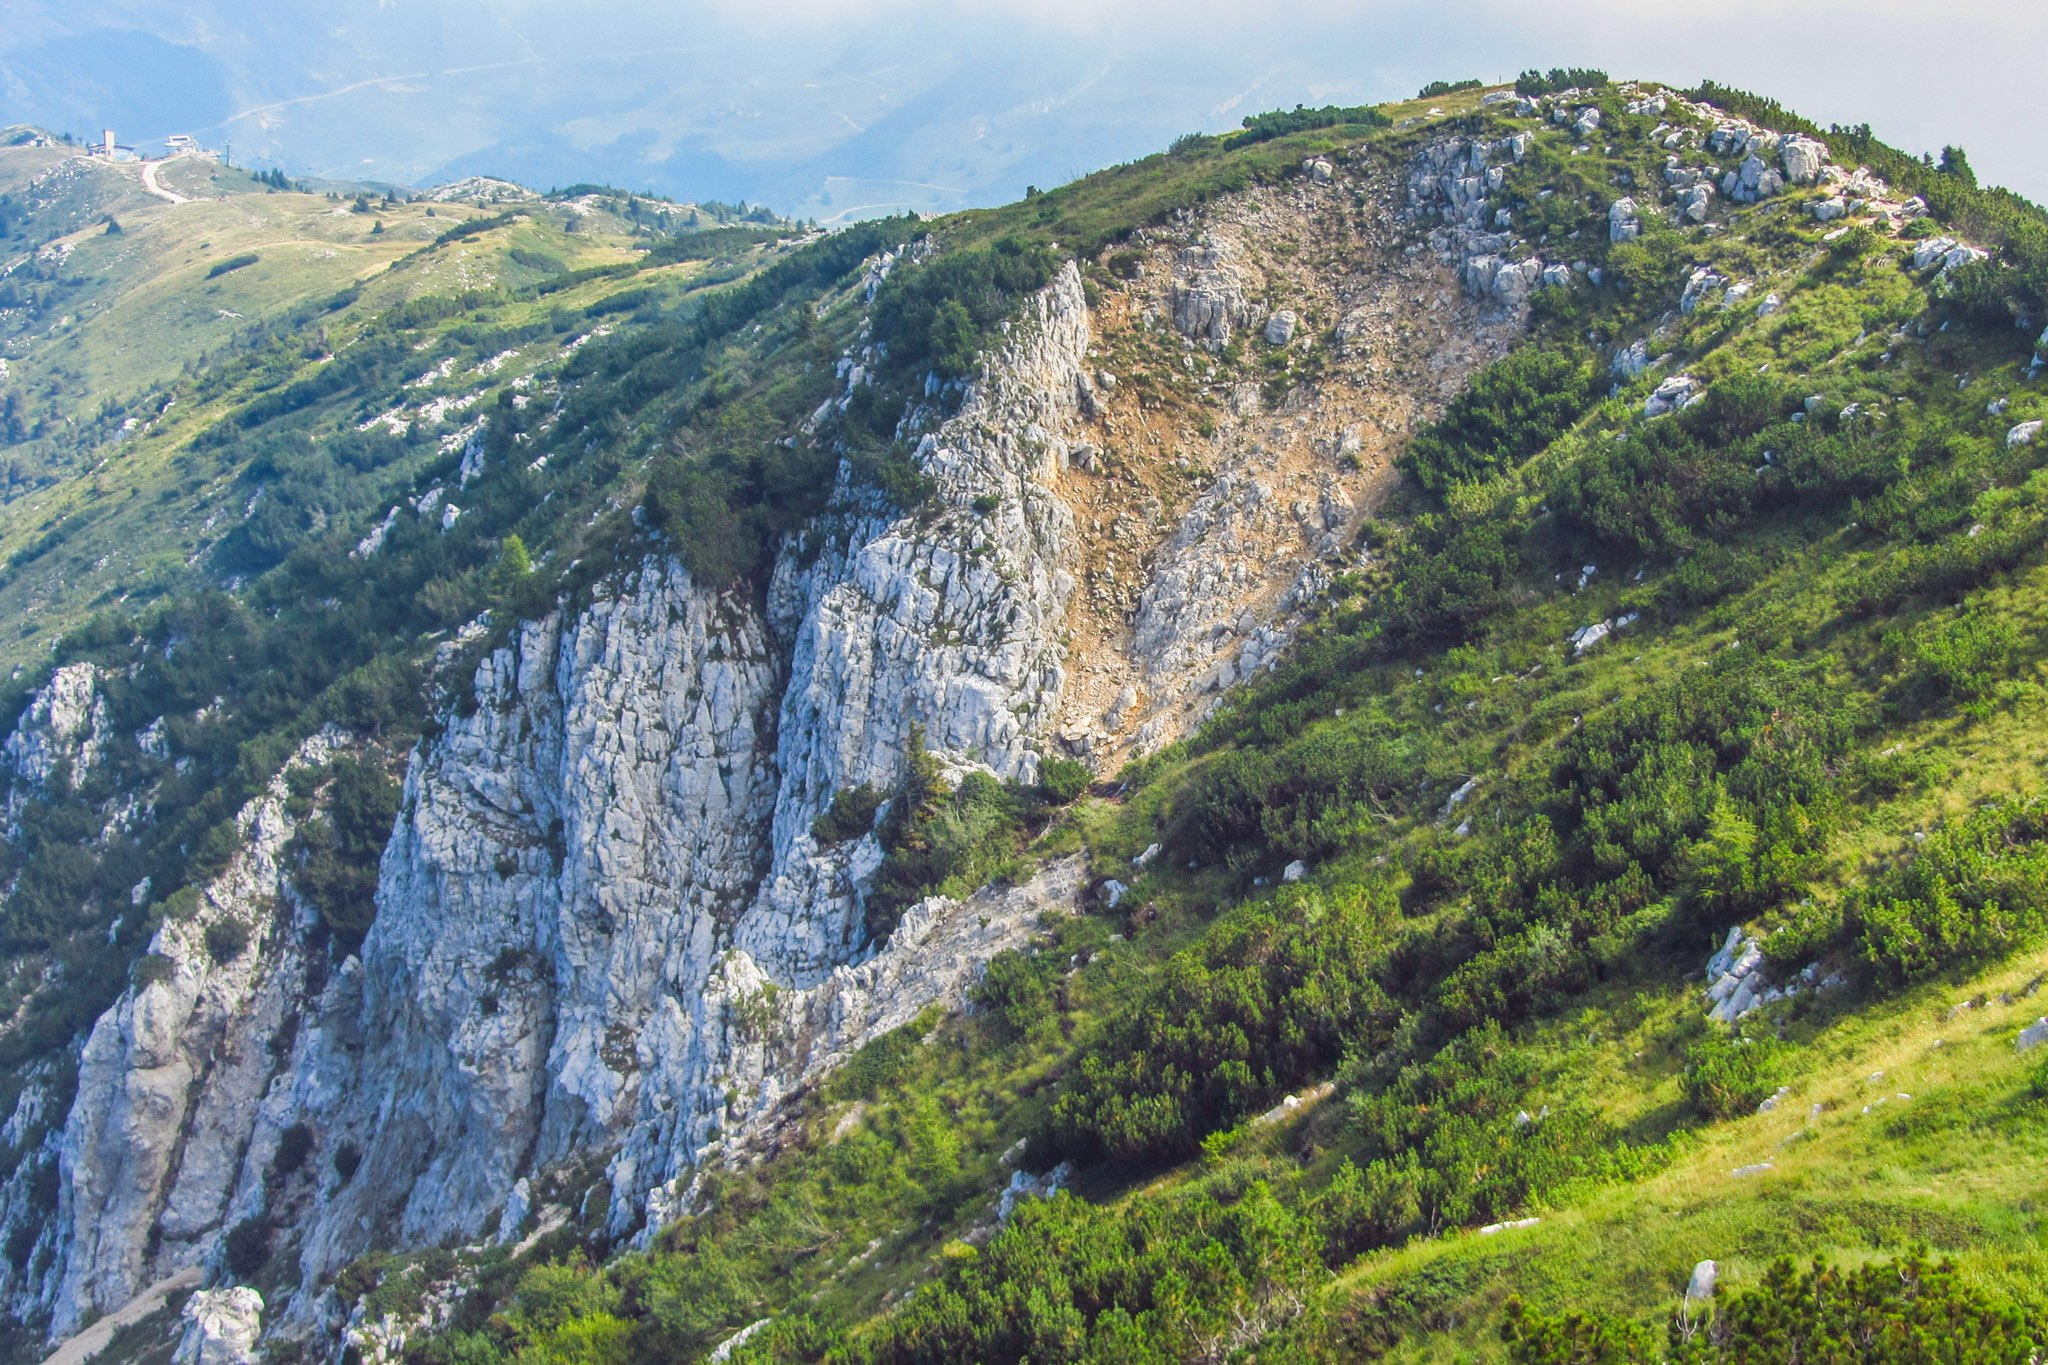 Auf dem Monte Baldo, nahe der Cima Pozzette